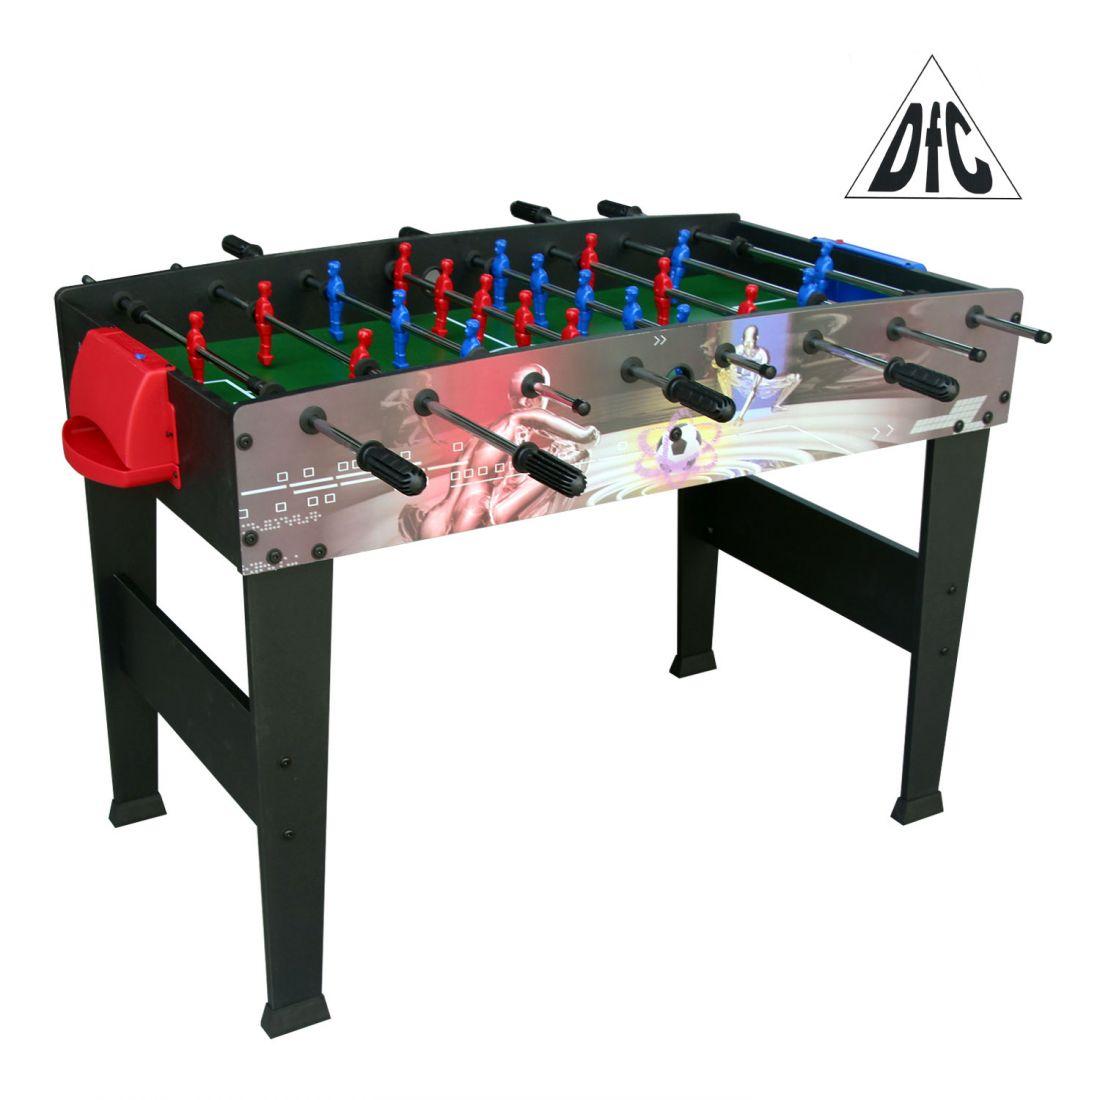 Игровой стол - футбол DFC RAPID футбол HM-ST-48006N